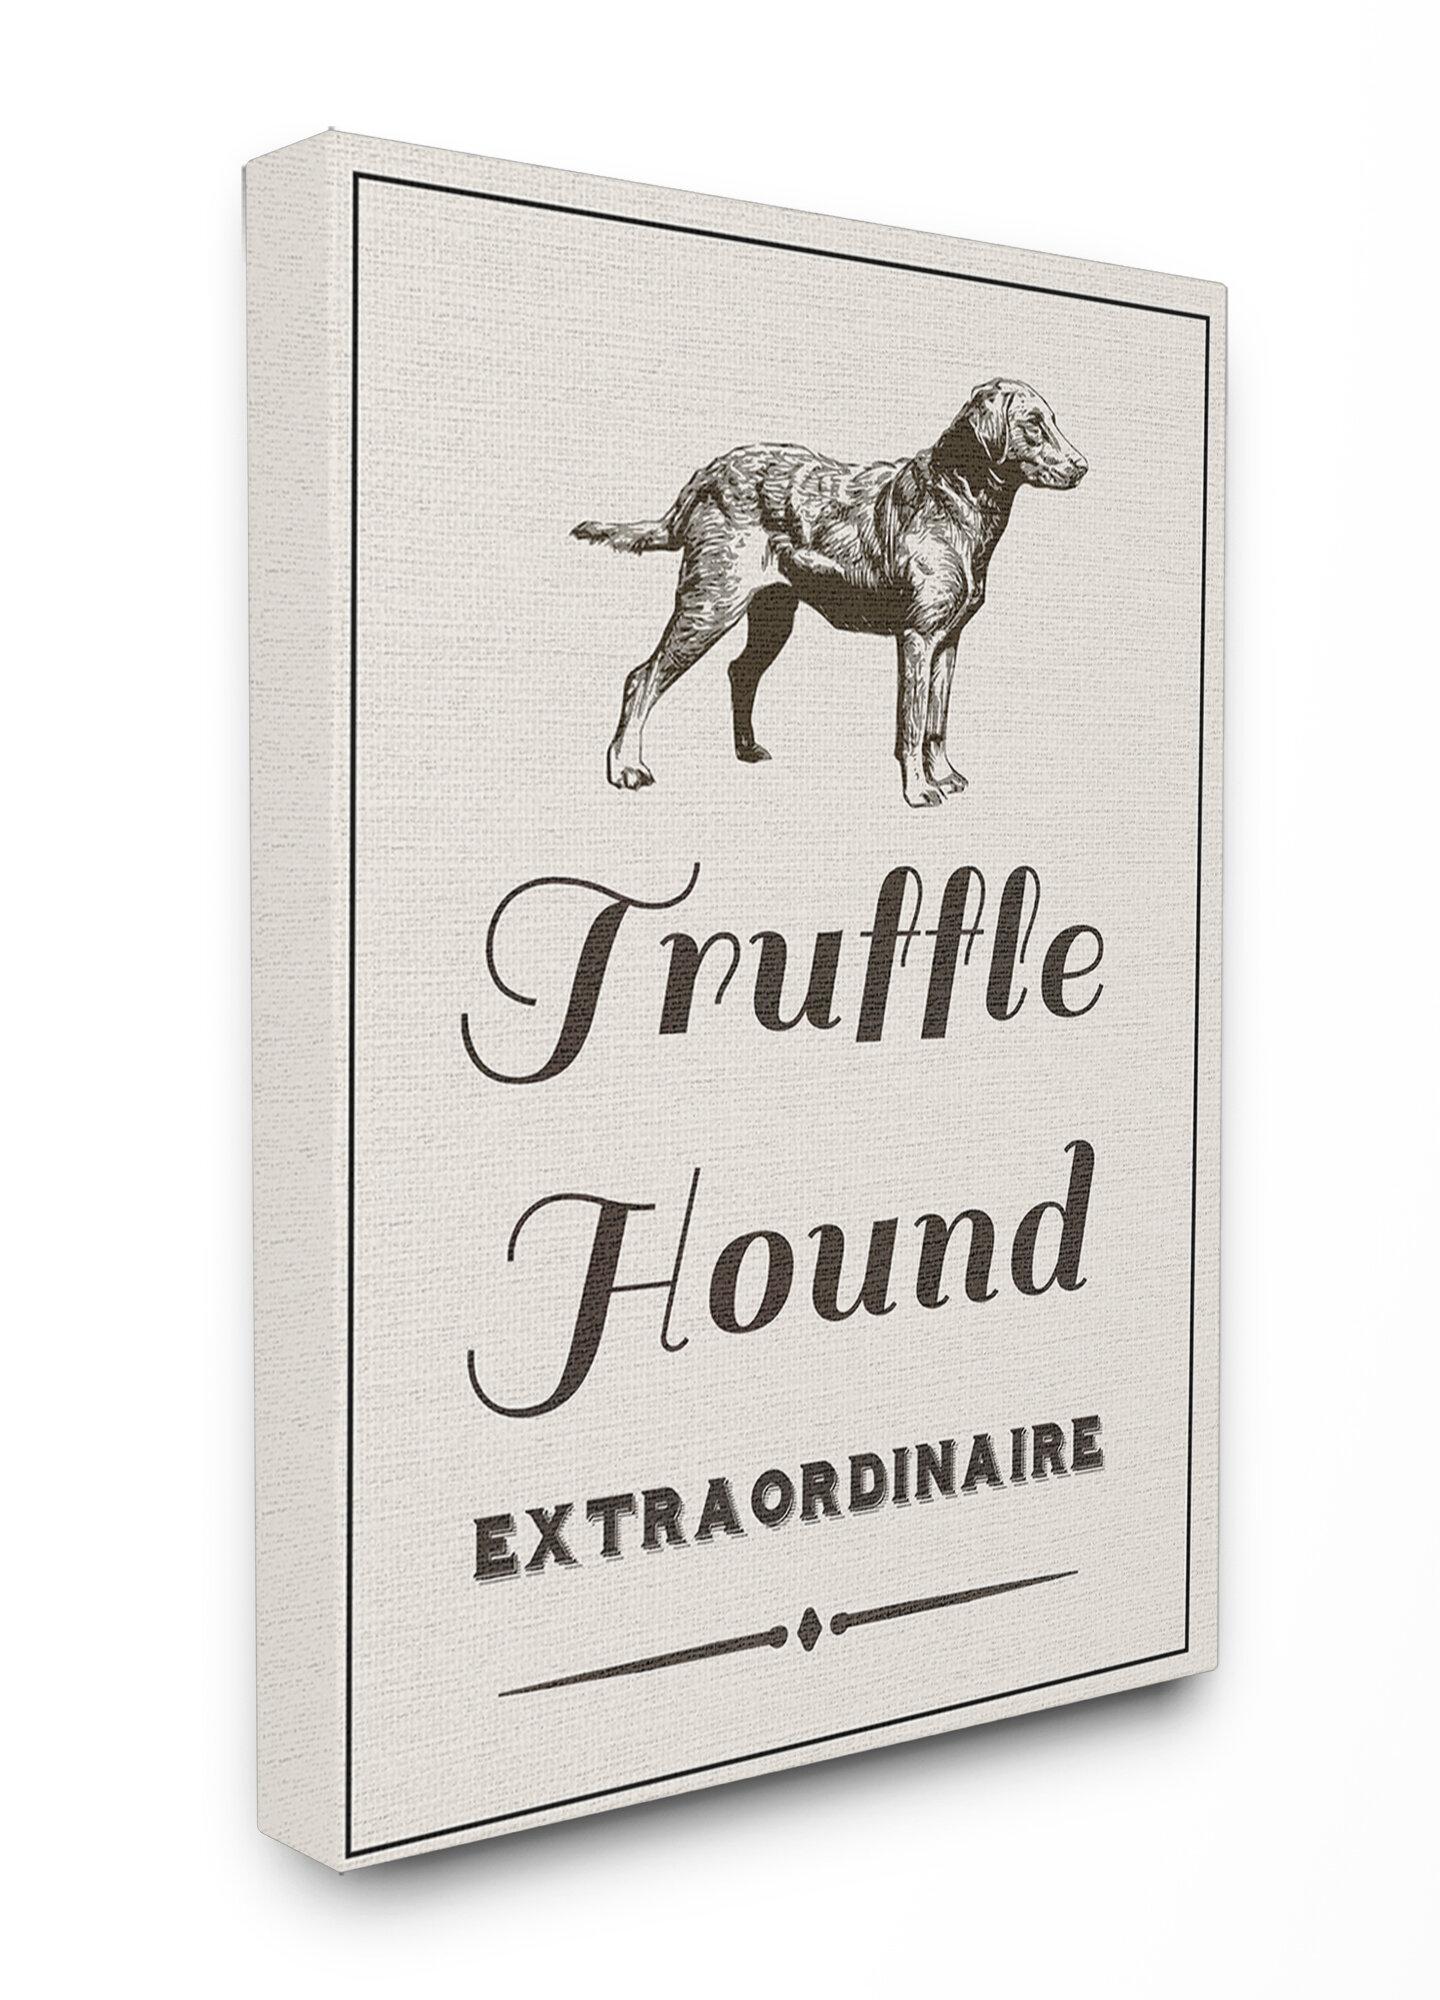 Winston Porter Truffle Hound Extraordinaire By Daphne Polselli Textual Art Print On Canvas Wayfair